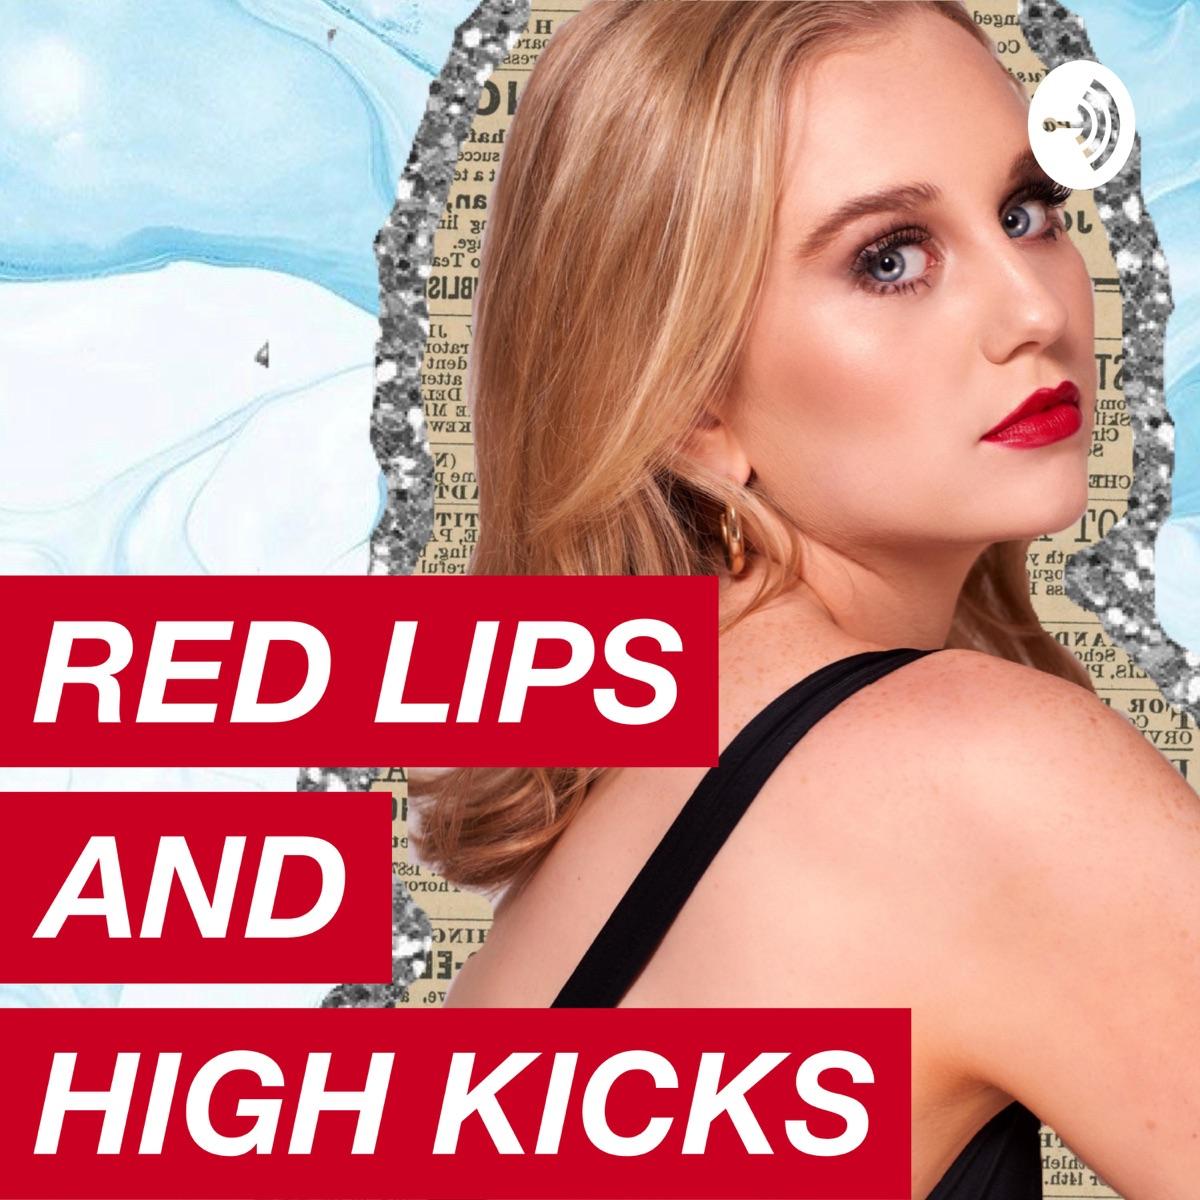 RED LIPS AND HIGH KICKS